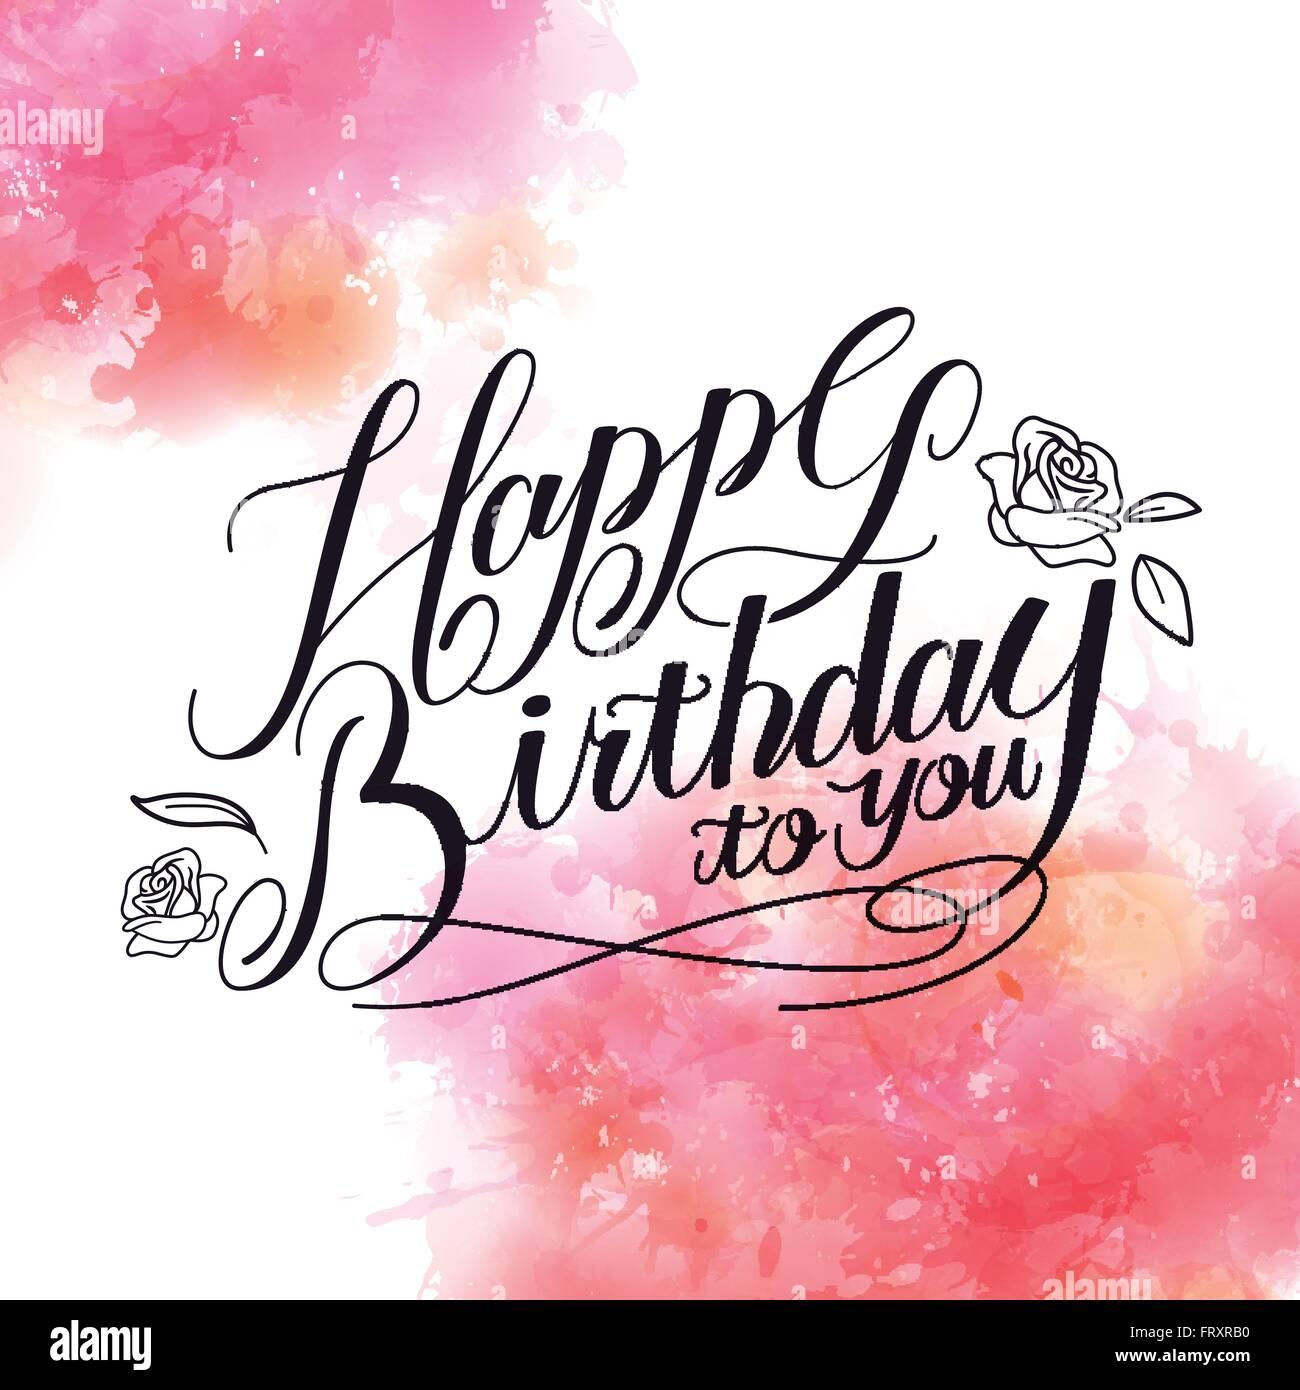 Romantic Happy Birthday Calligraphy Design With Watercolor